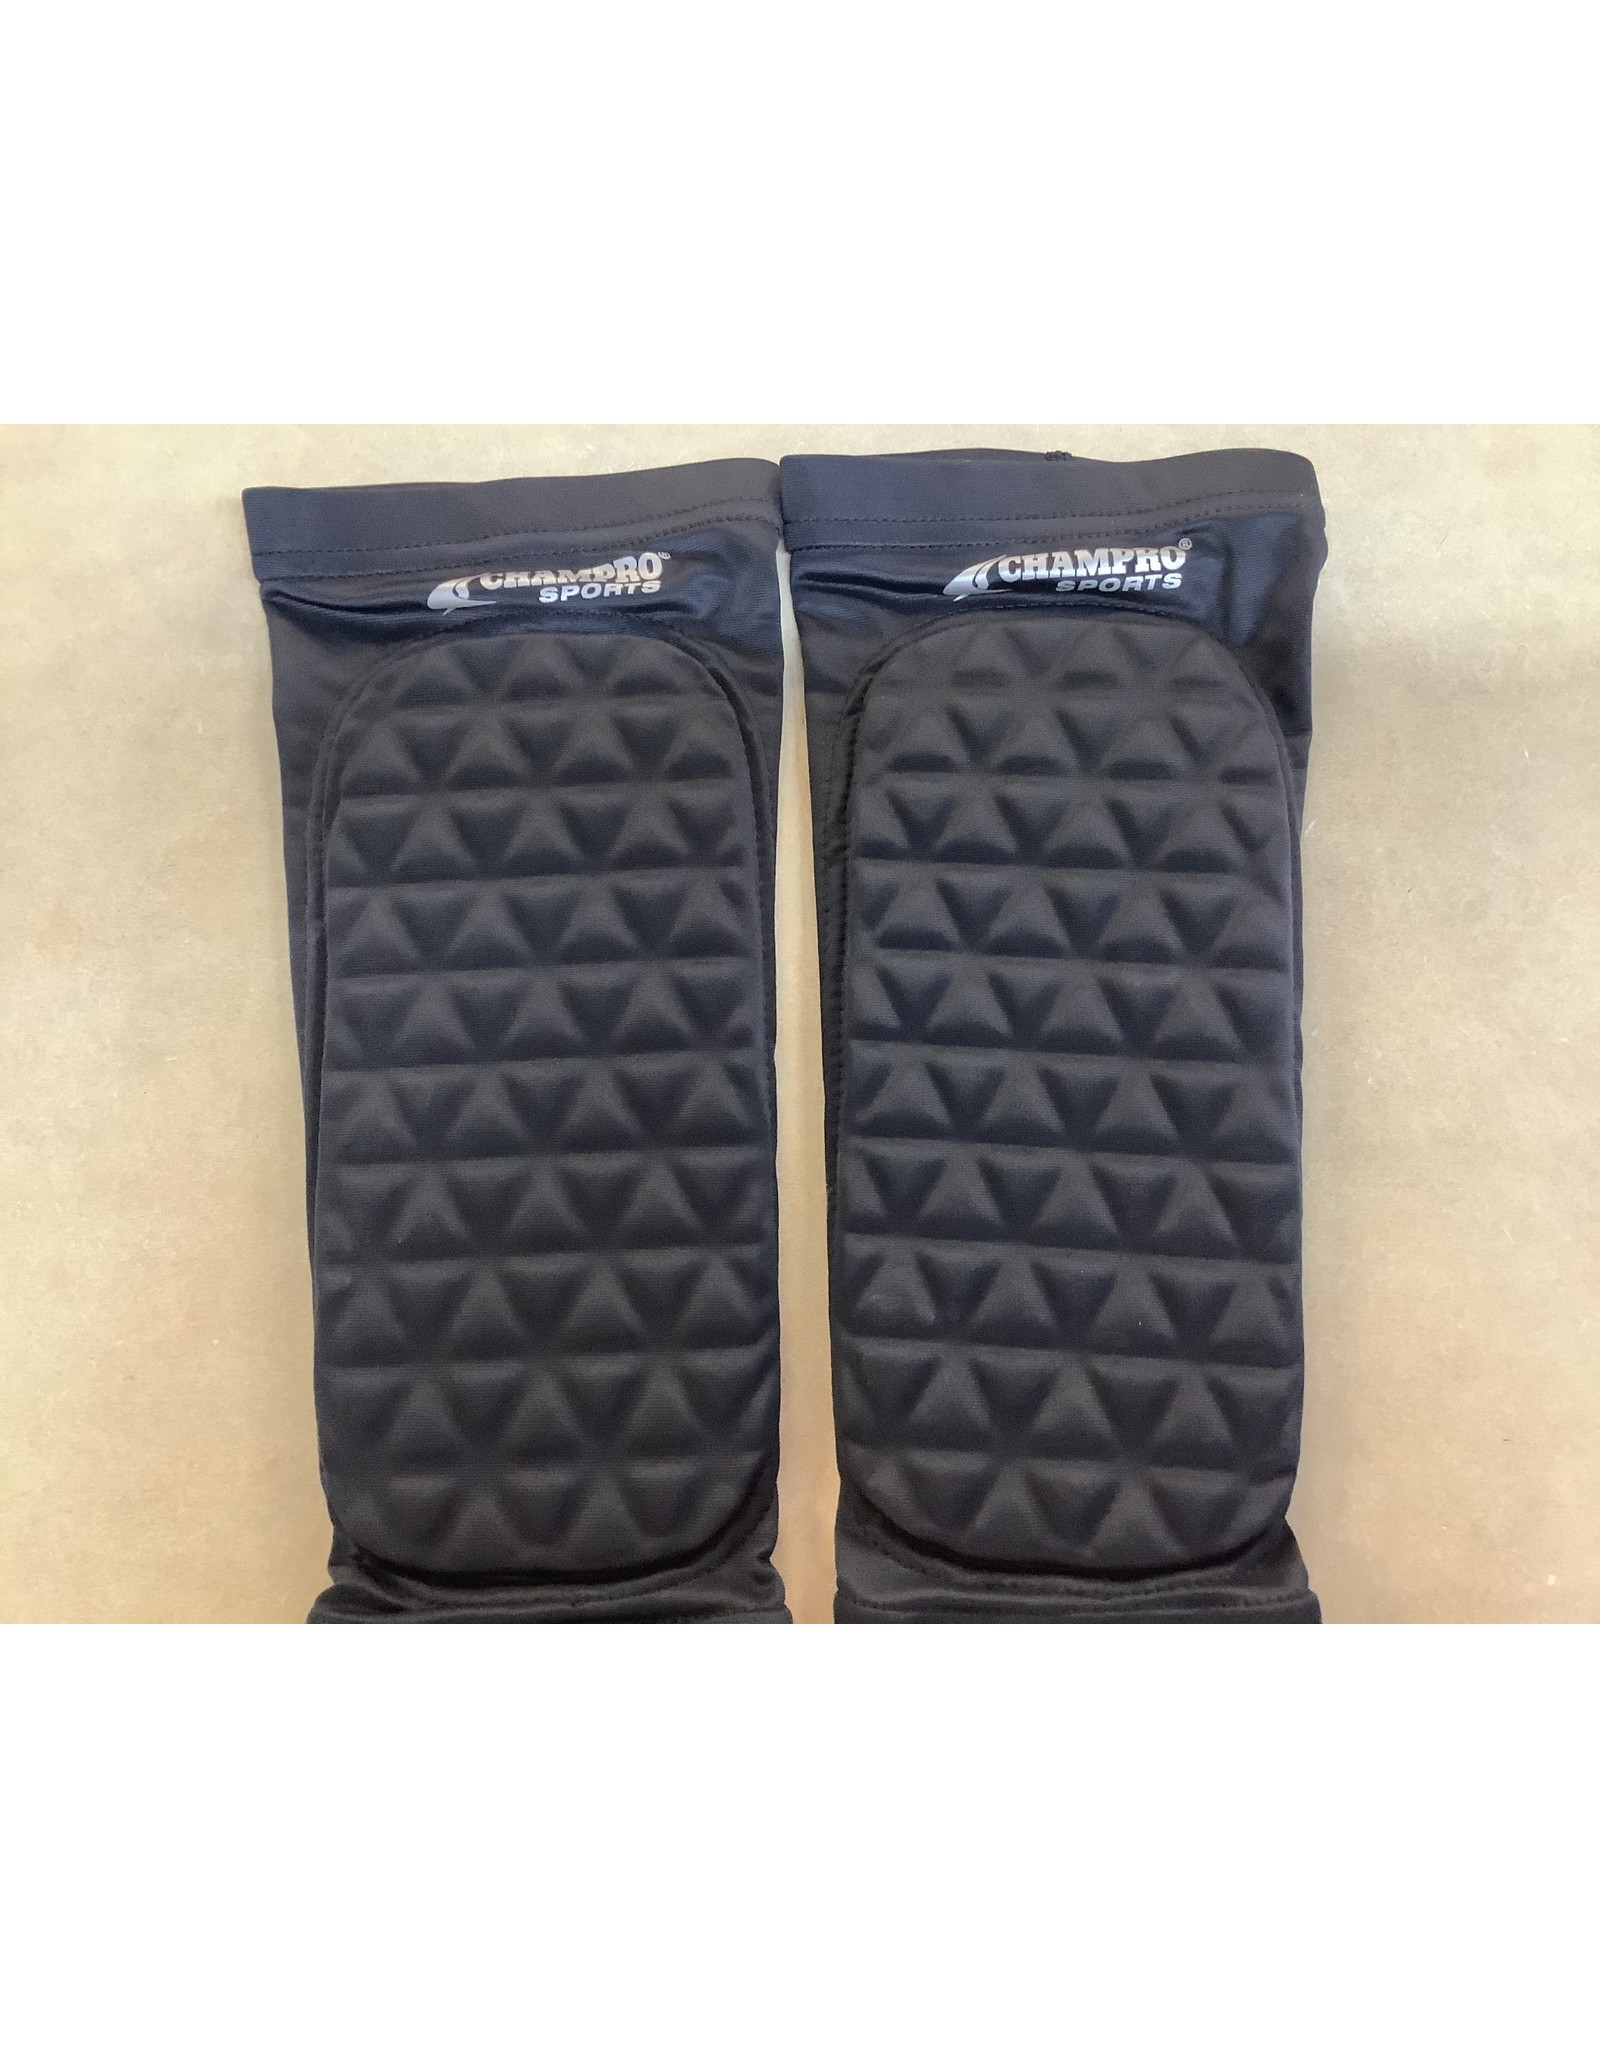 Champro Tri-flex Protective Forearm Sleeve - Varsity - Pair